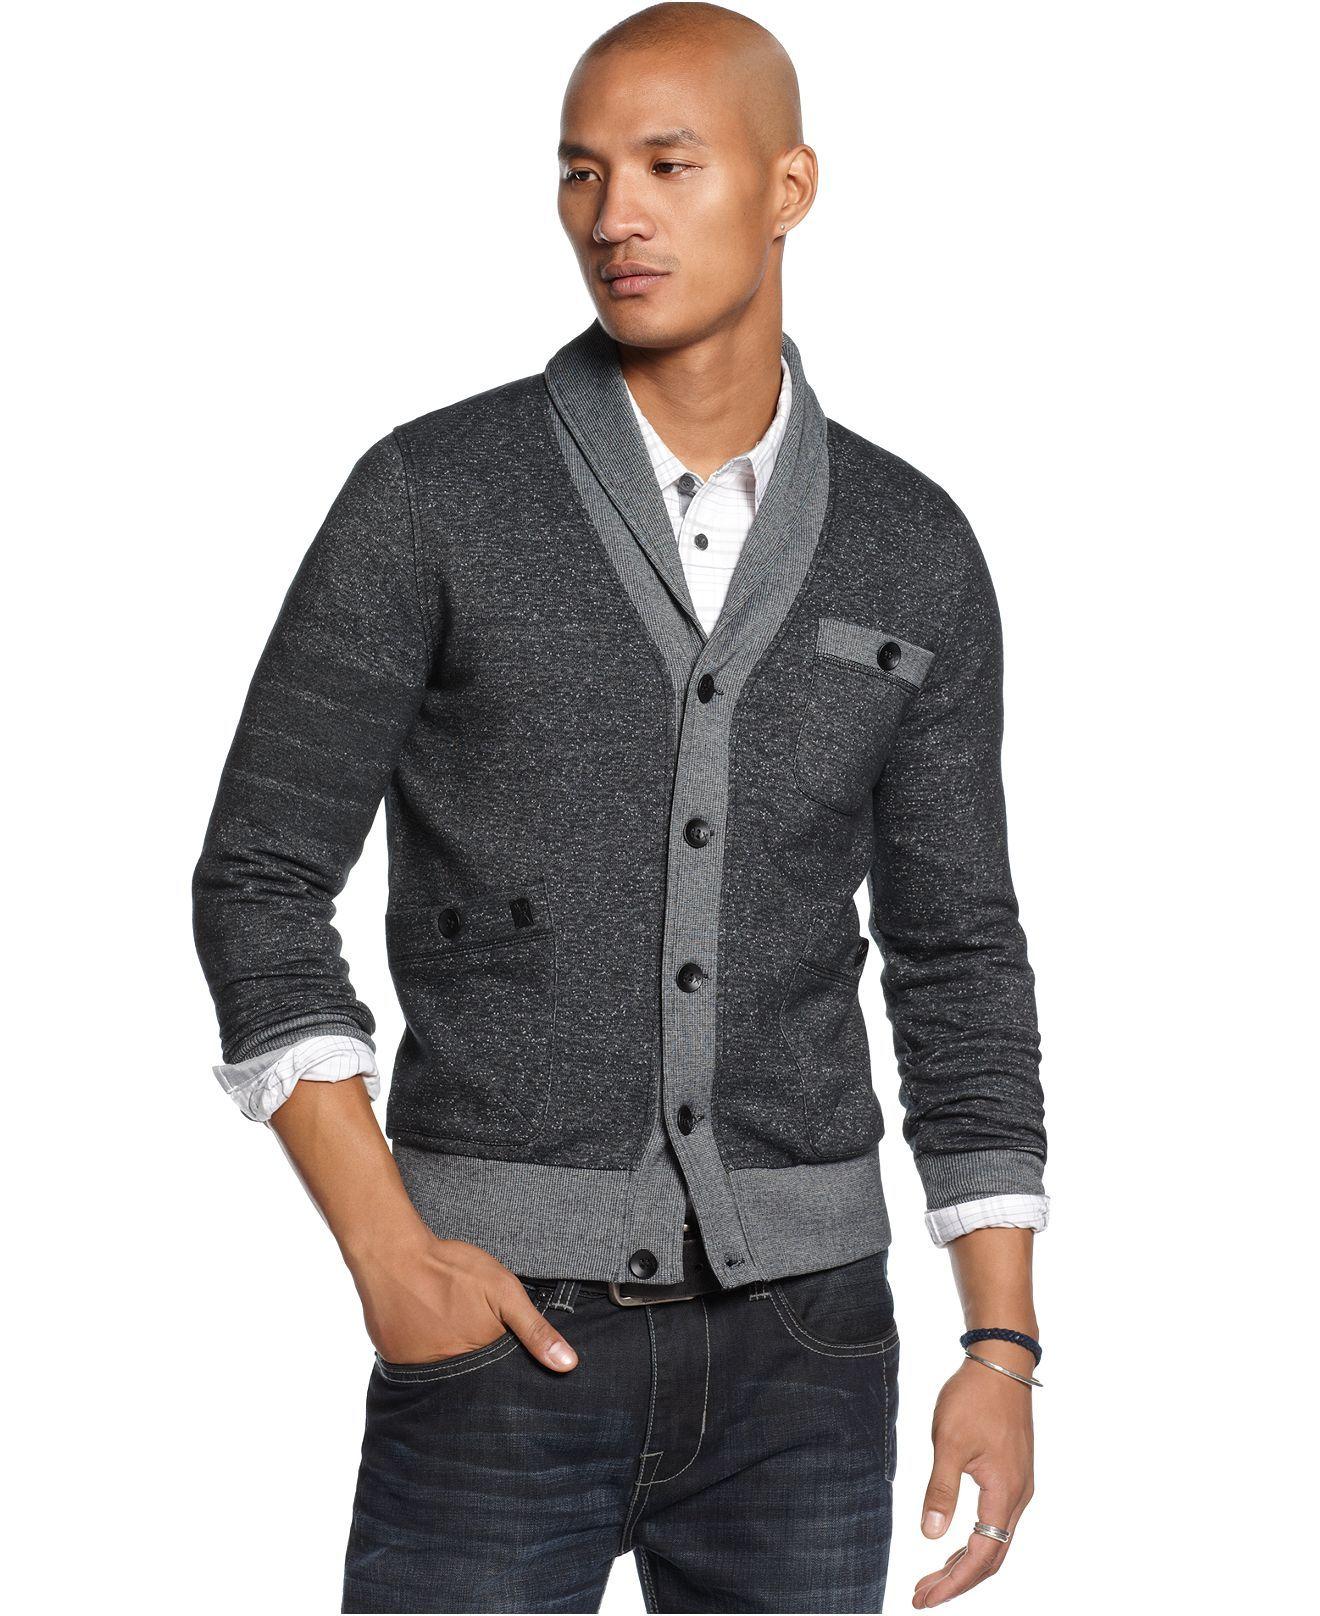 0beaa057b9 Marc Ecko Cut   Sew Sweater